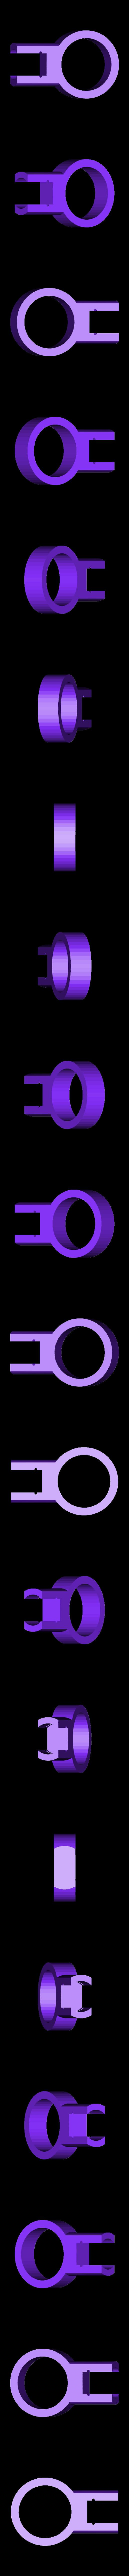 sujeta destornillador 2.STL Download free STL file soporte destornillador • 3D printing model, Thinking3Dthings